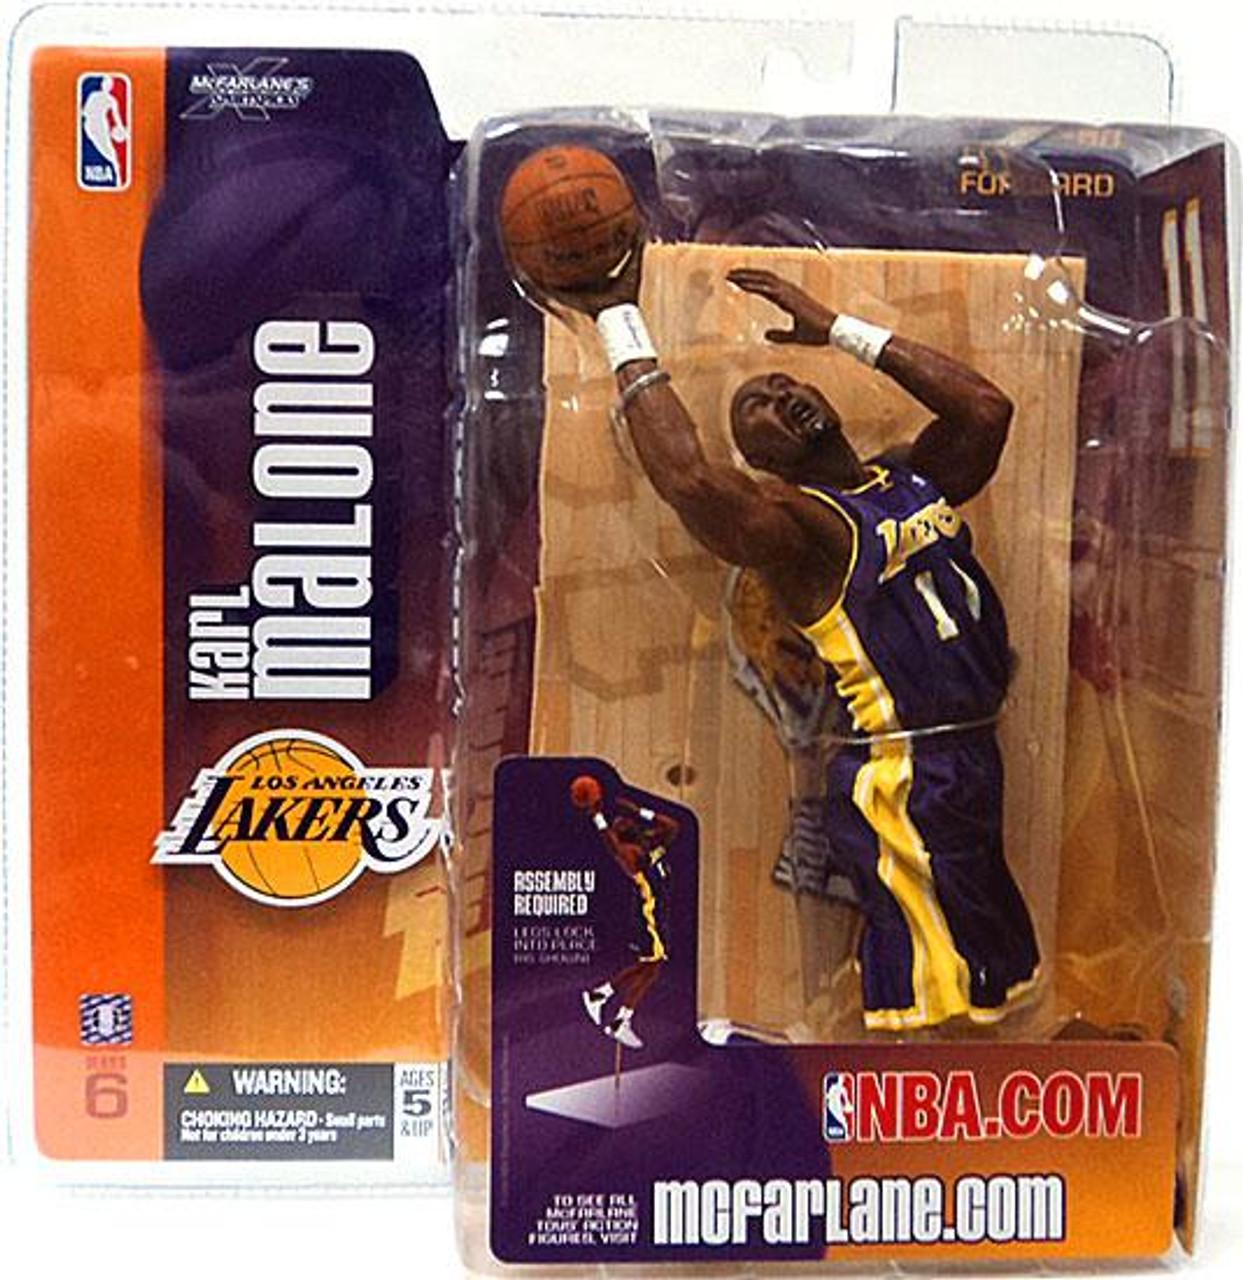 McFarlane Toys NBA Los Angeles Lakers Sports Picks Series 6 Karl Malone Action Figure [Purple Jersey]